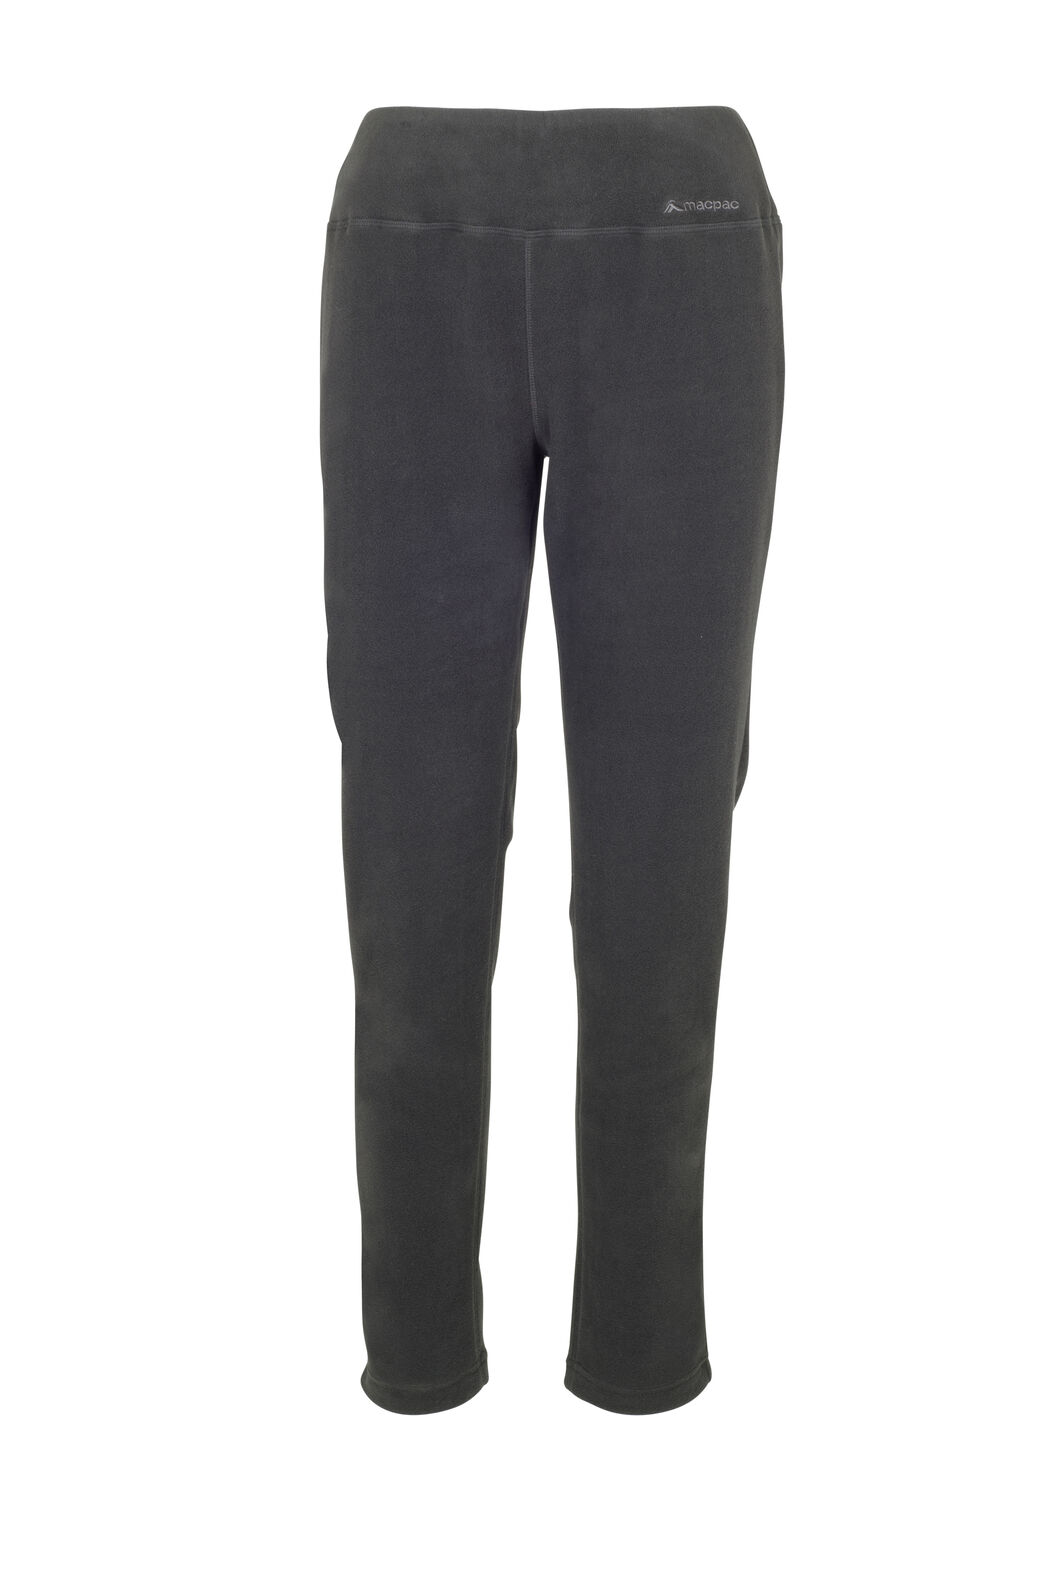 Macpac Kea Polartec® Micro Fleece® Pants - Women's, Black, hi-res